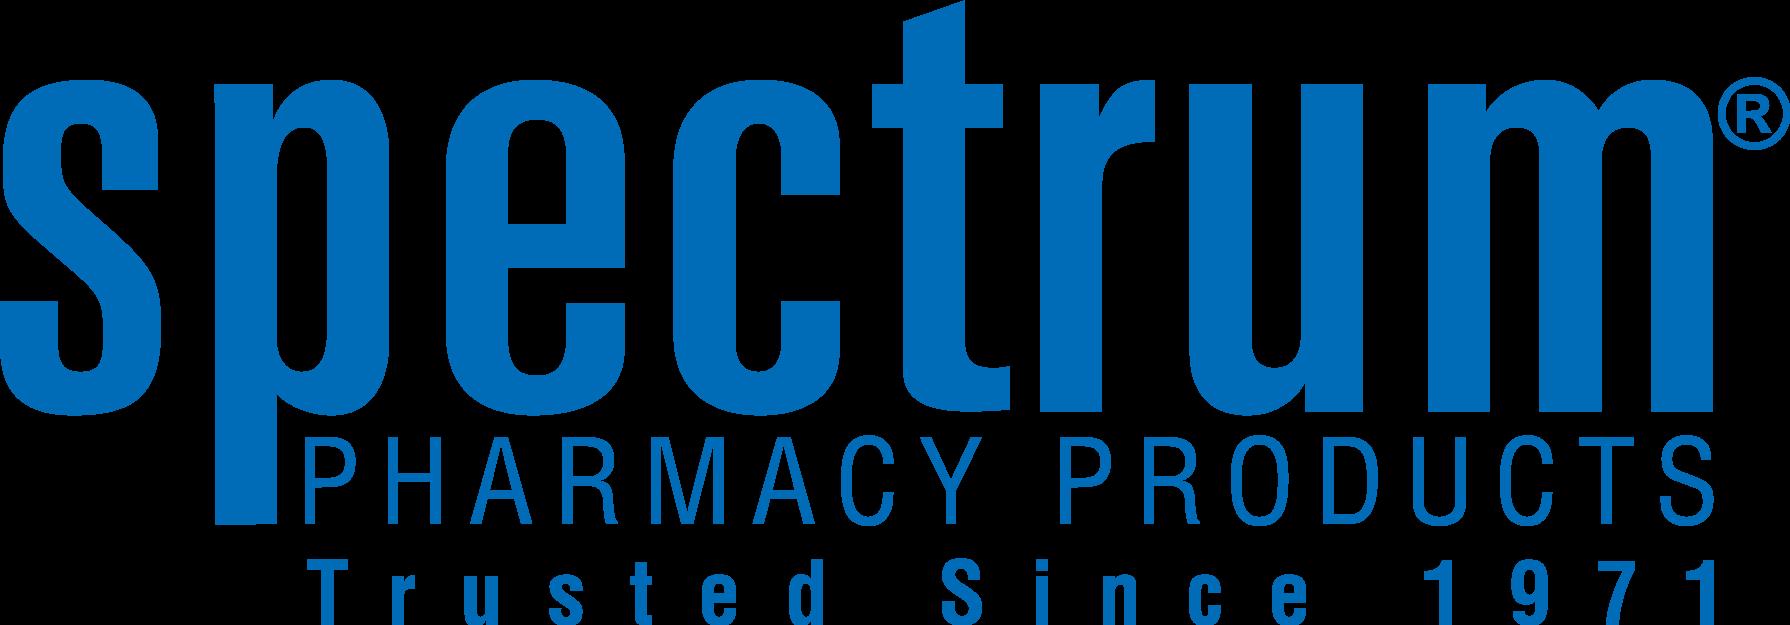 Spectrum Pharmacy Products